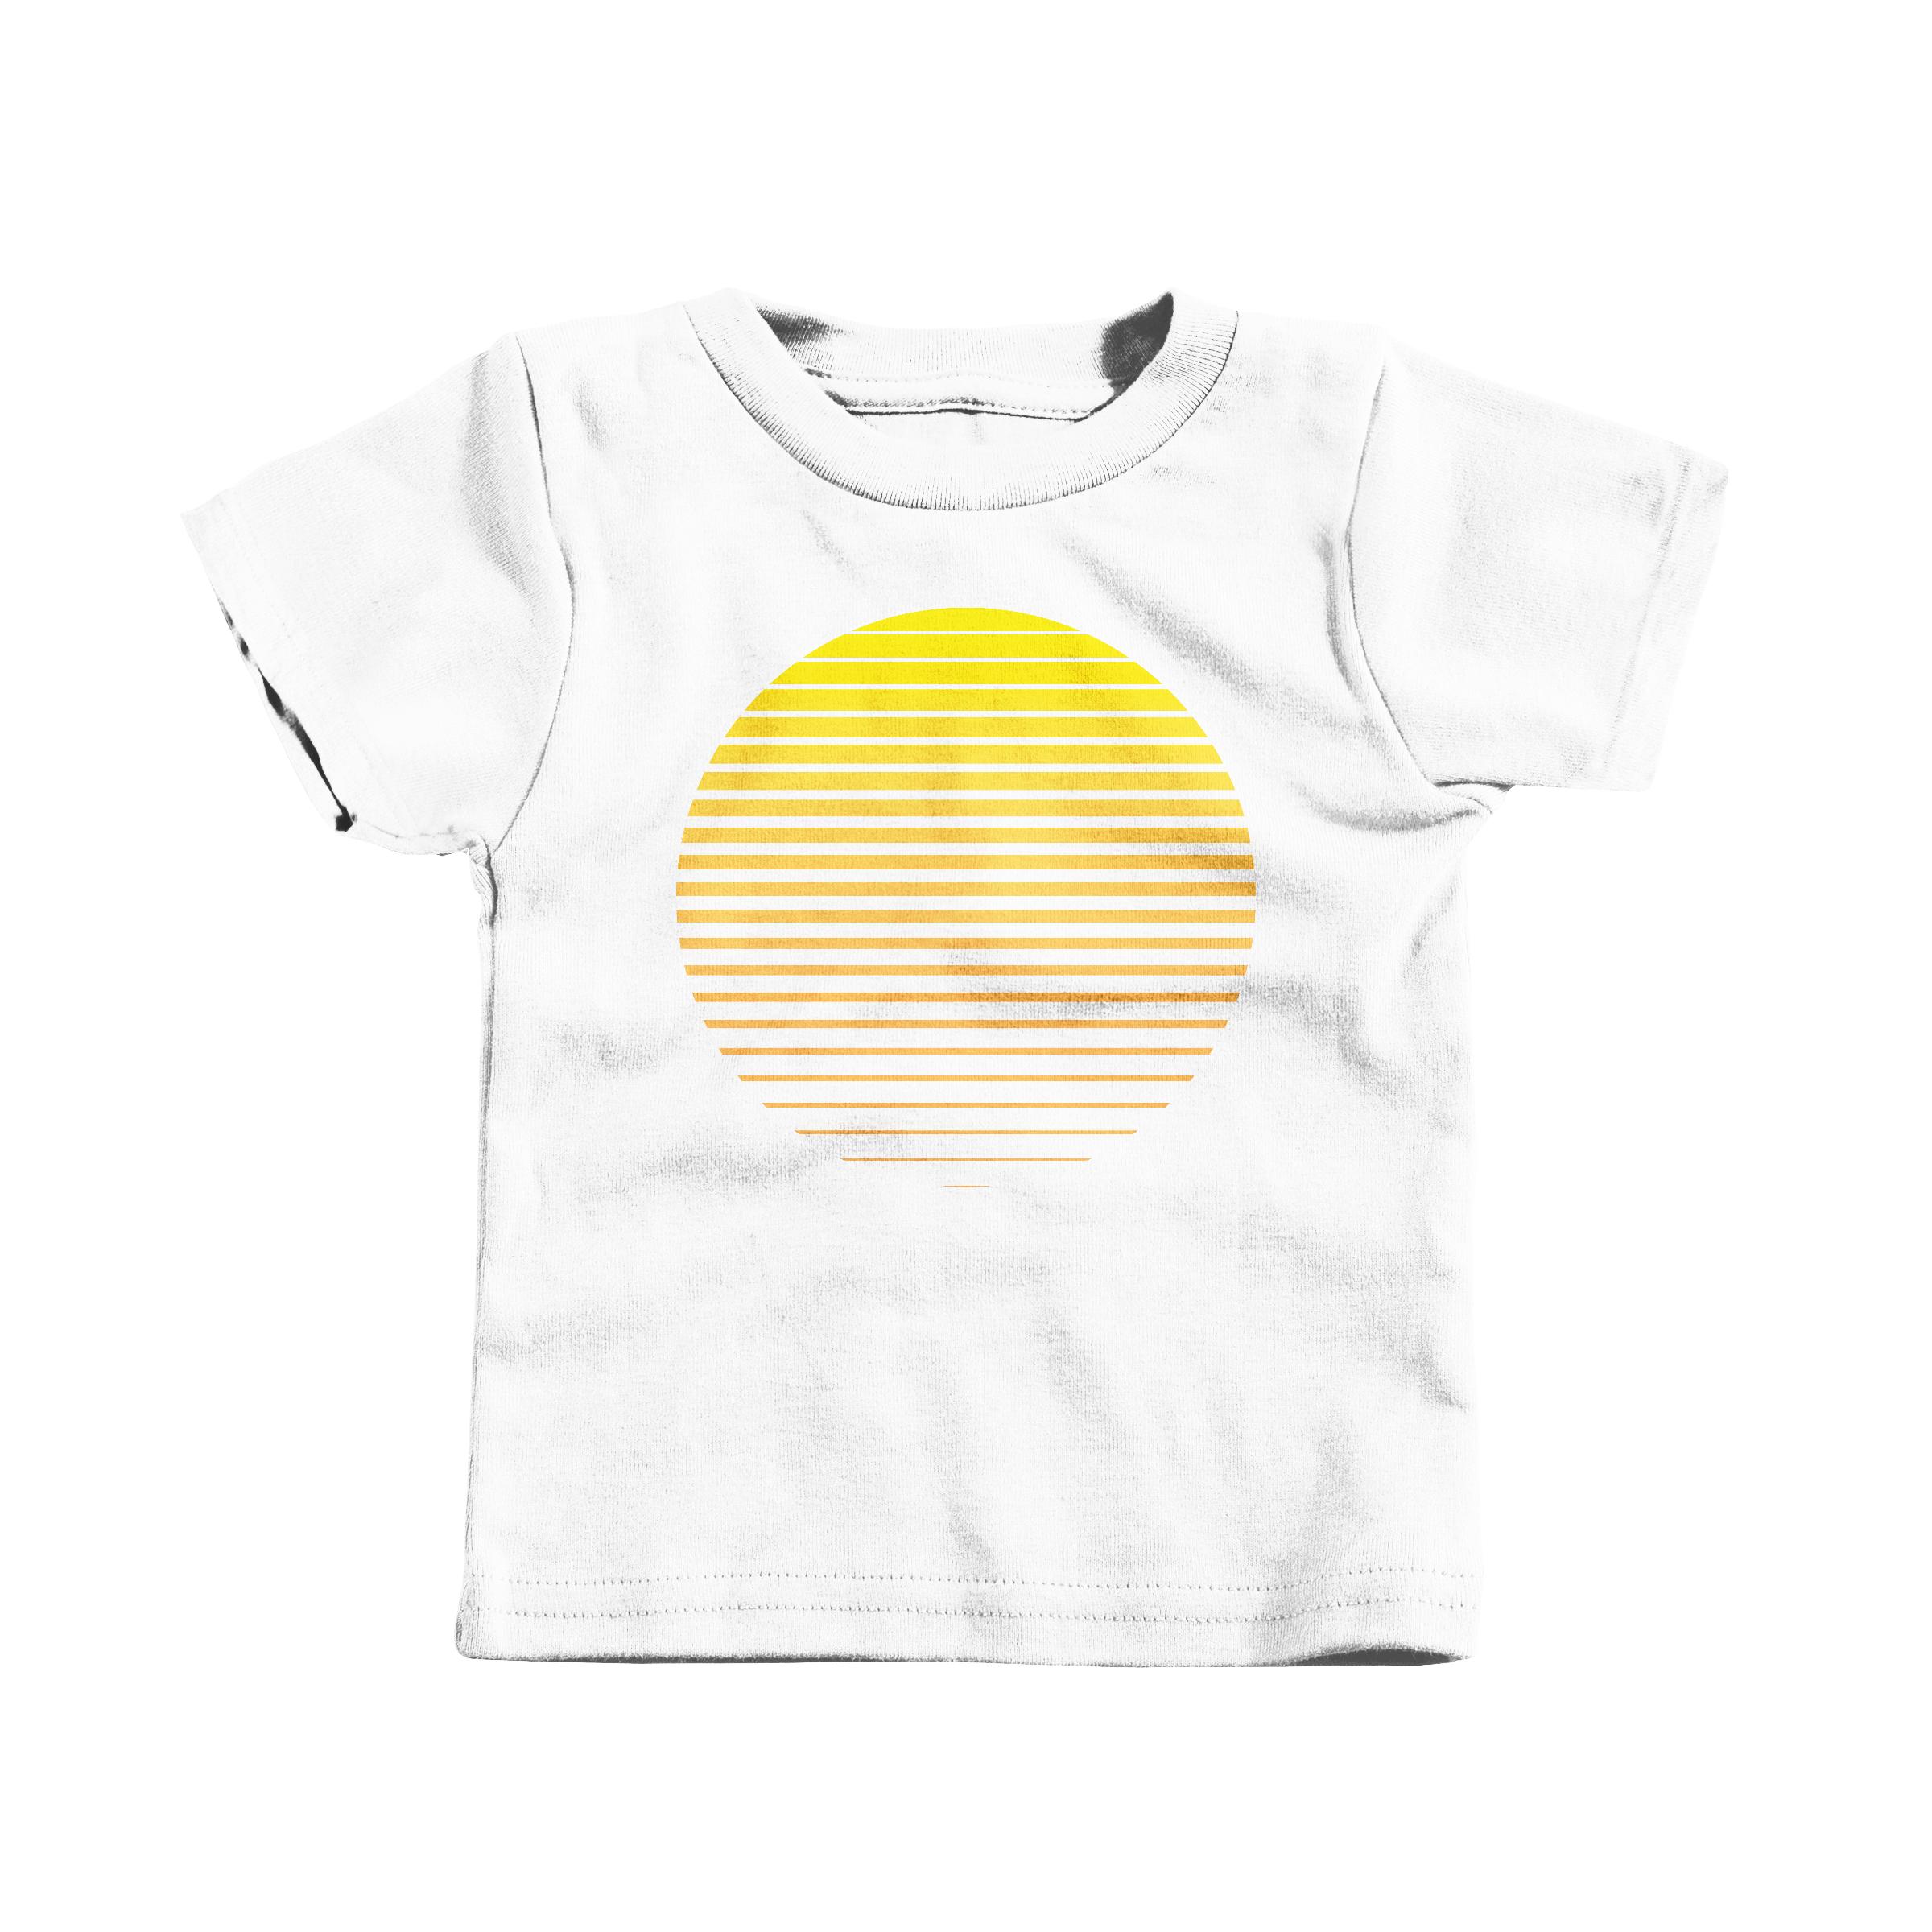 Sunrise White (T-Shirt)